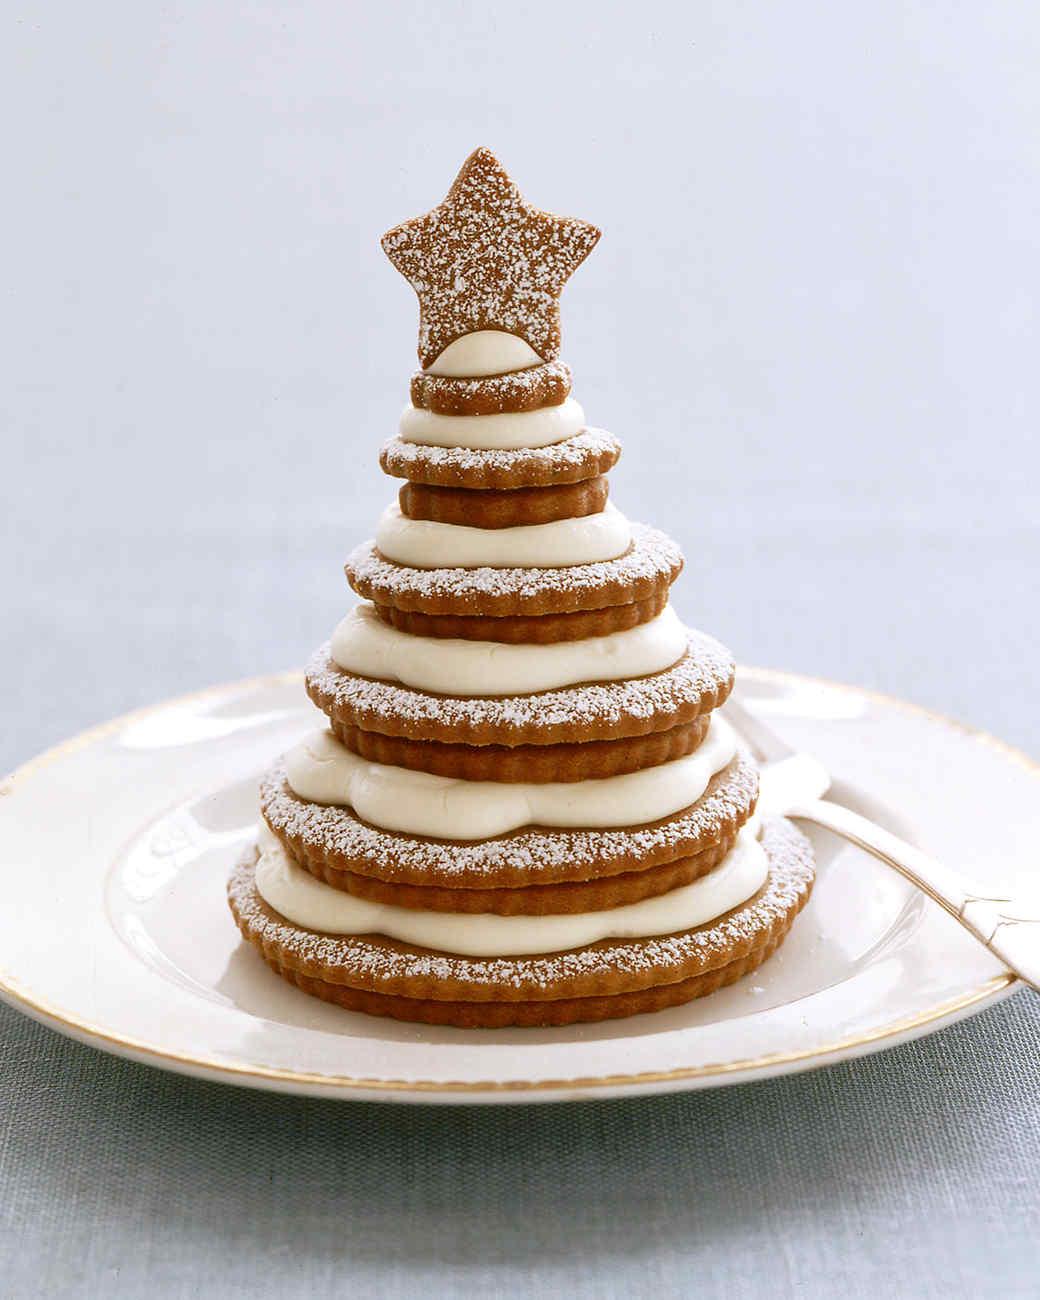 20 Years of Living: The Best Christmas Desserts | Martha Stewart